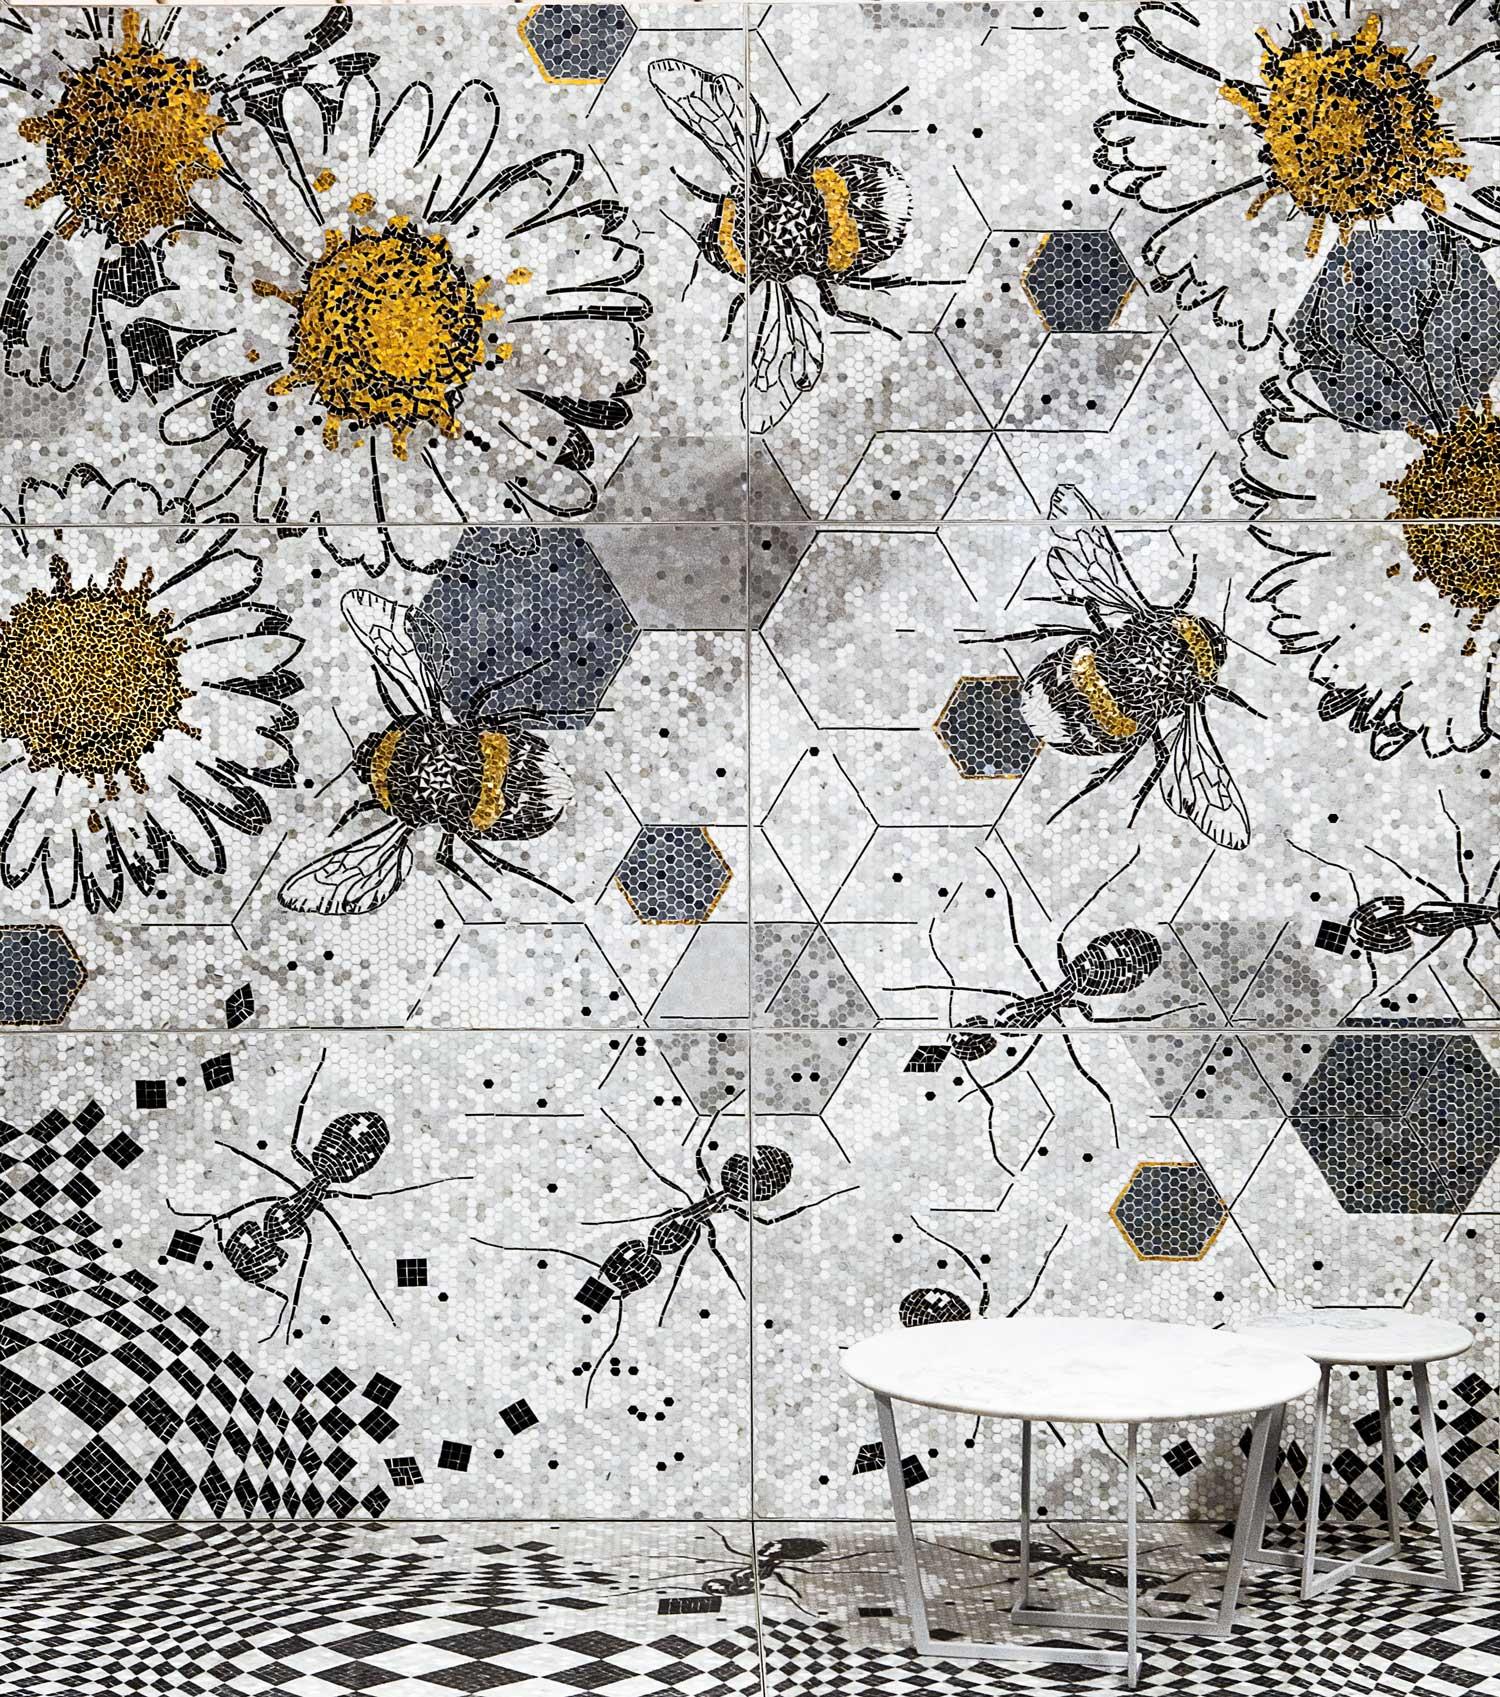 Ant Martina Franca lithos – lithos mosaico italia